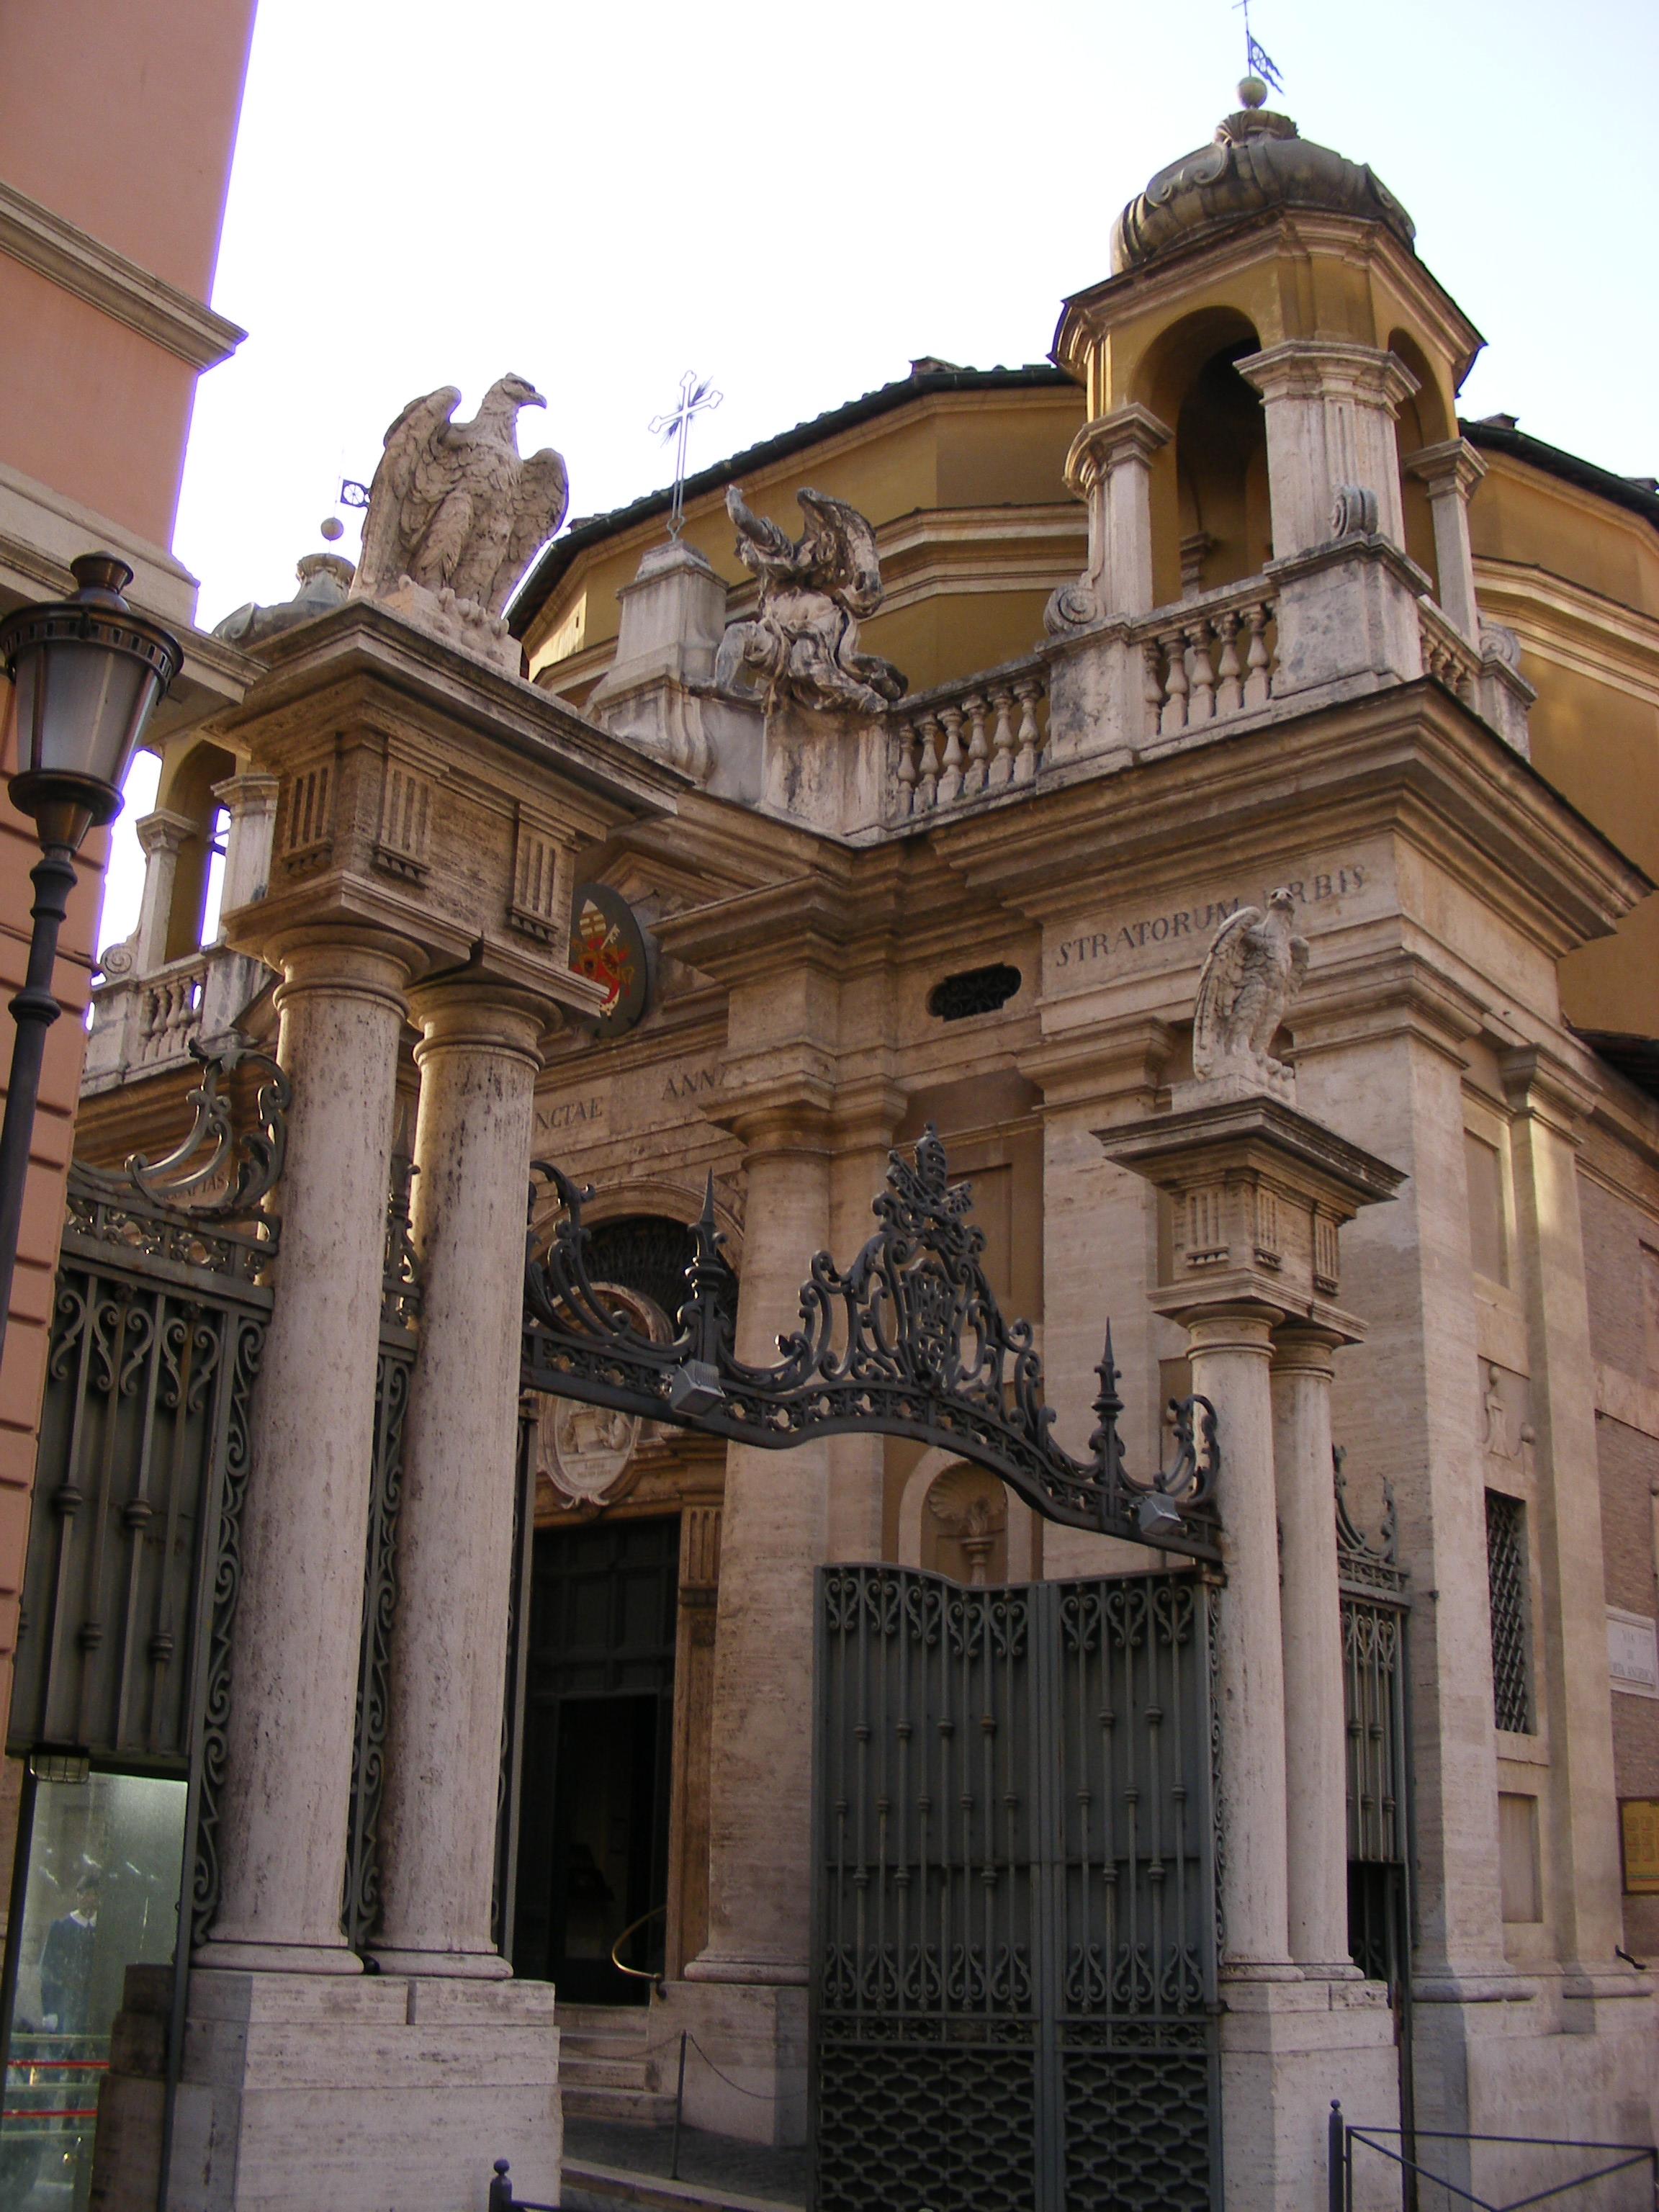 Sant'Anna dei Palafrenieri